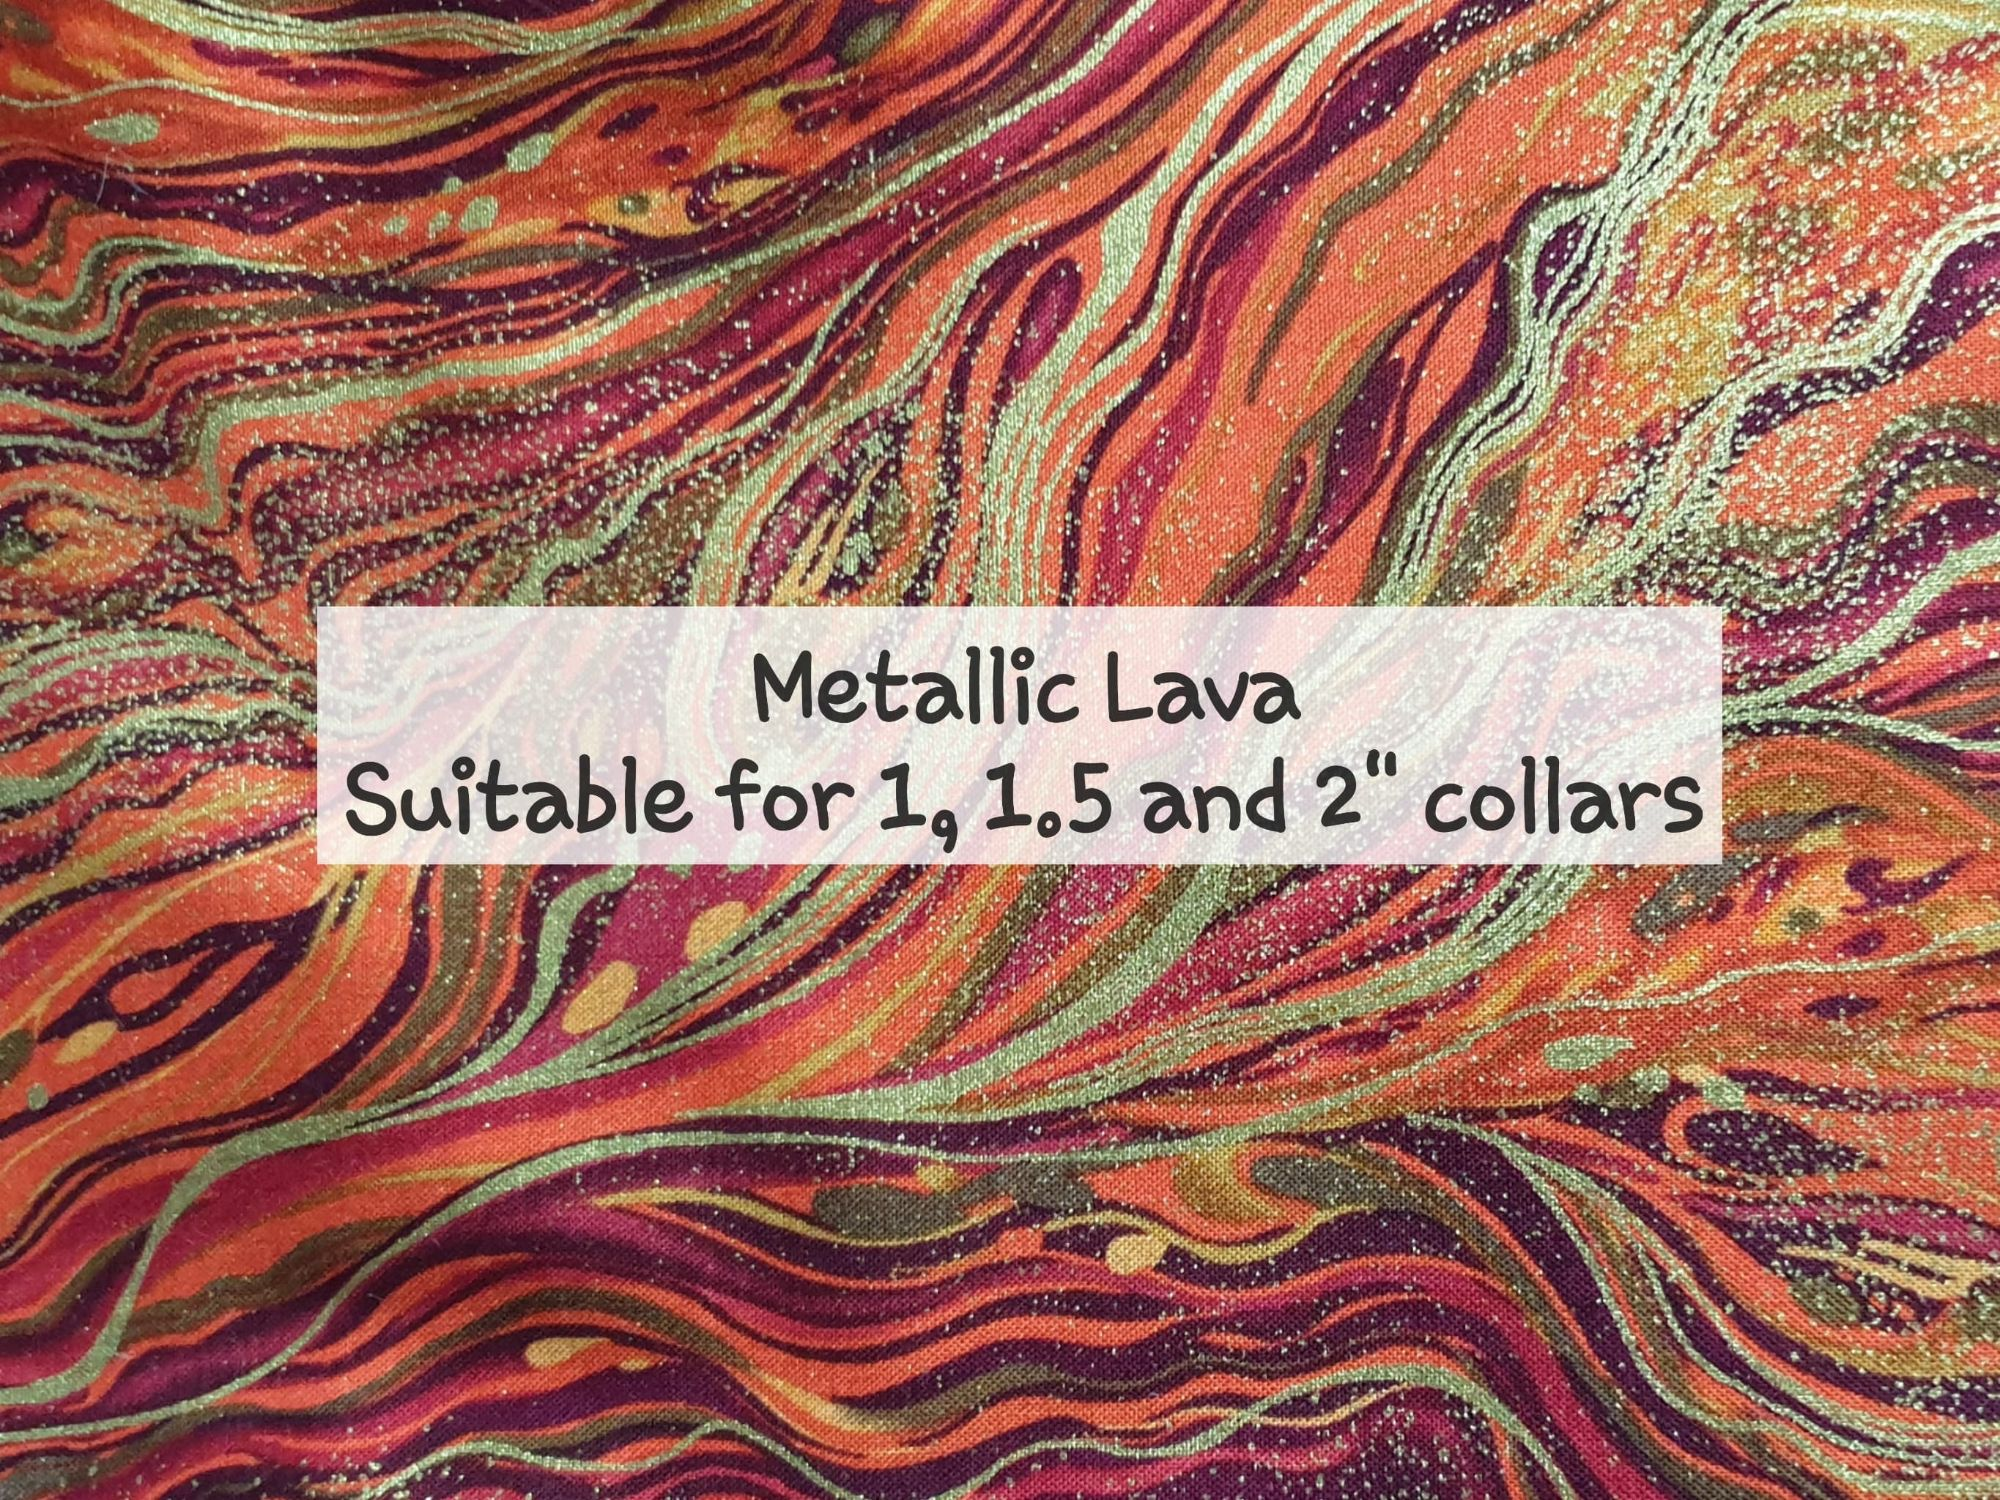 metallic lava